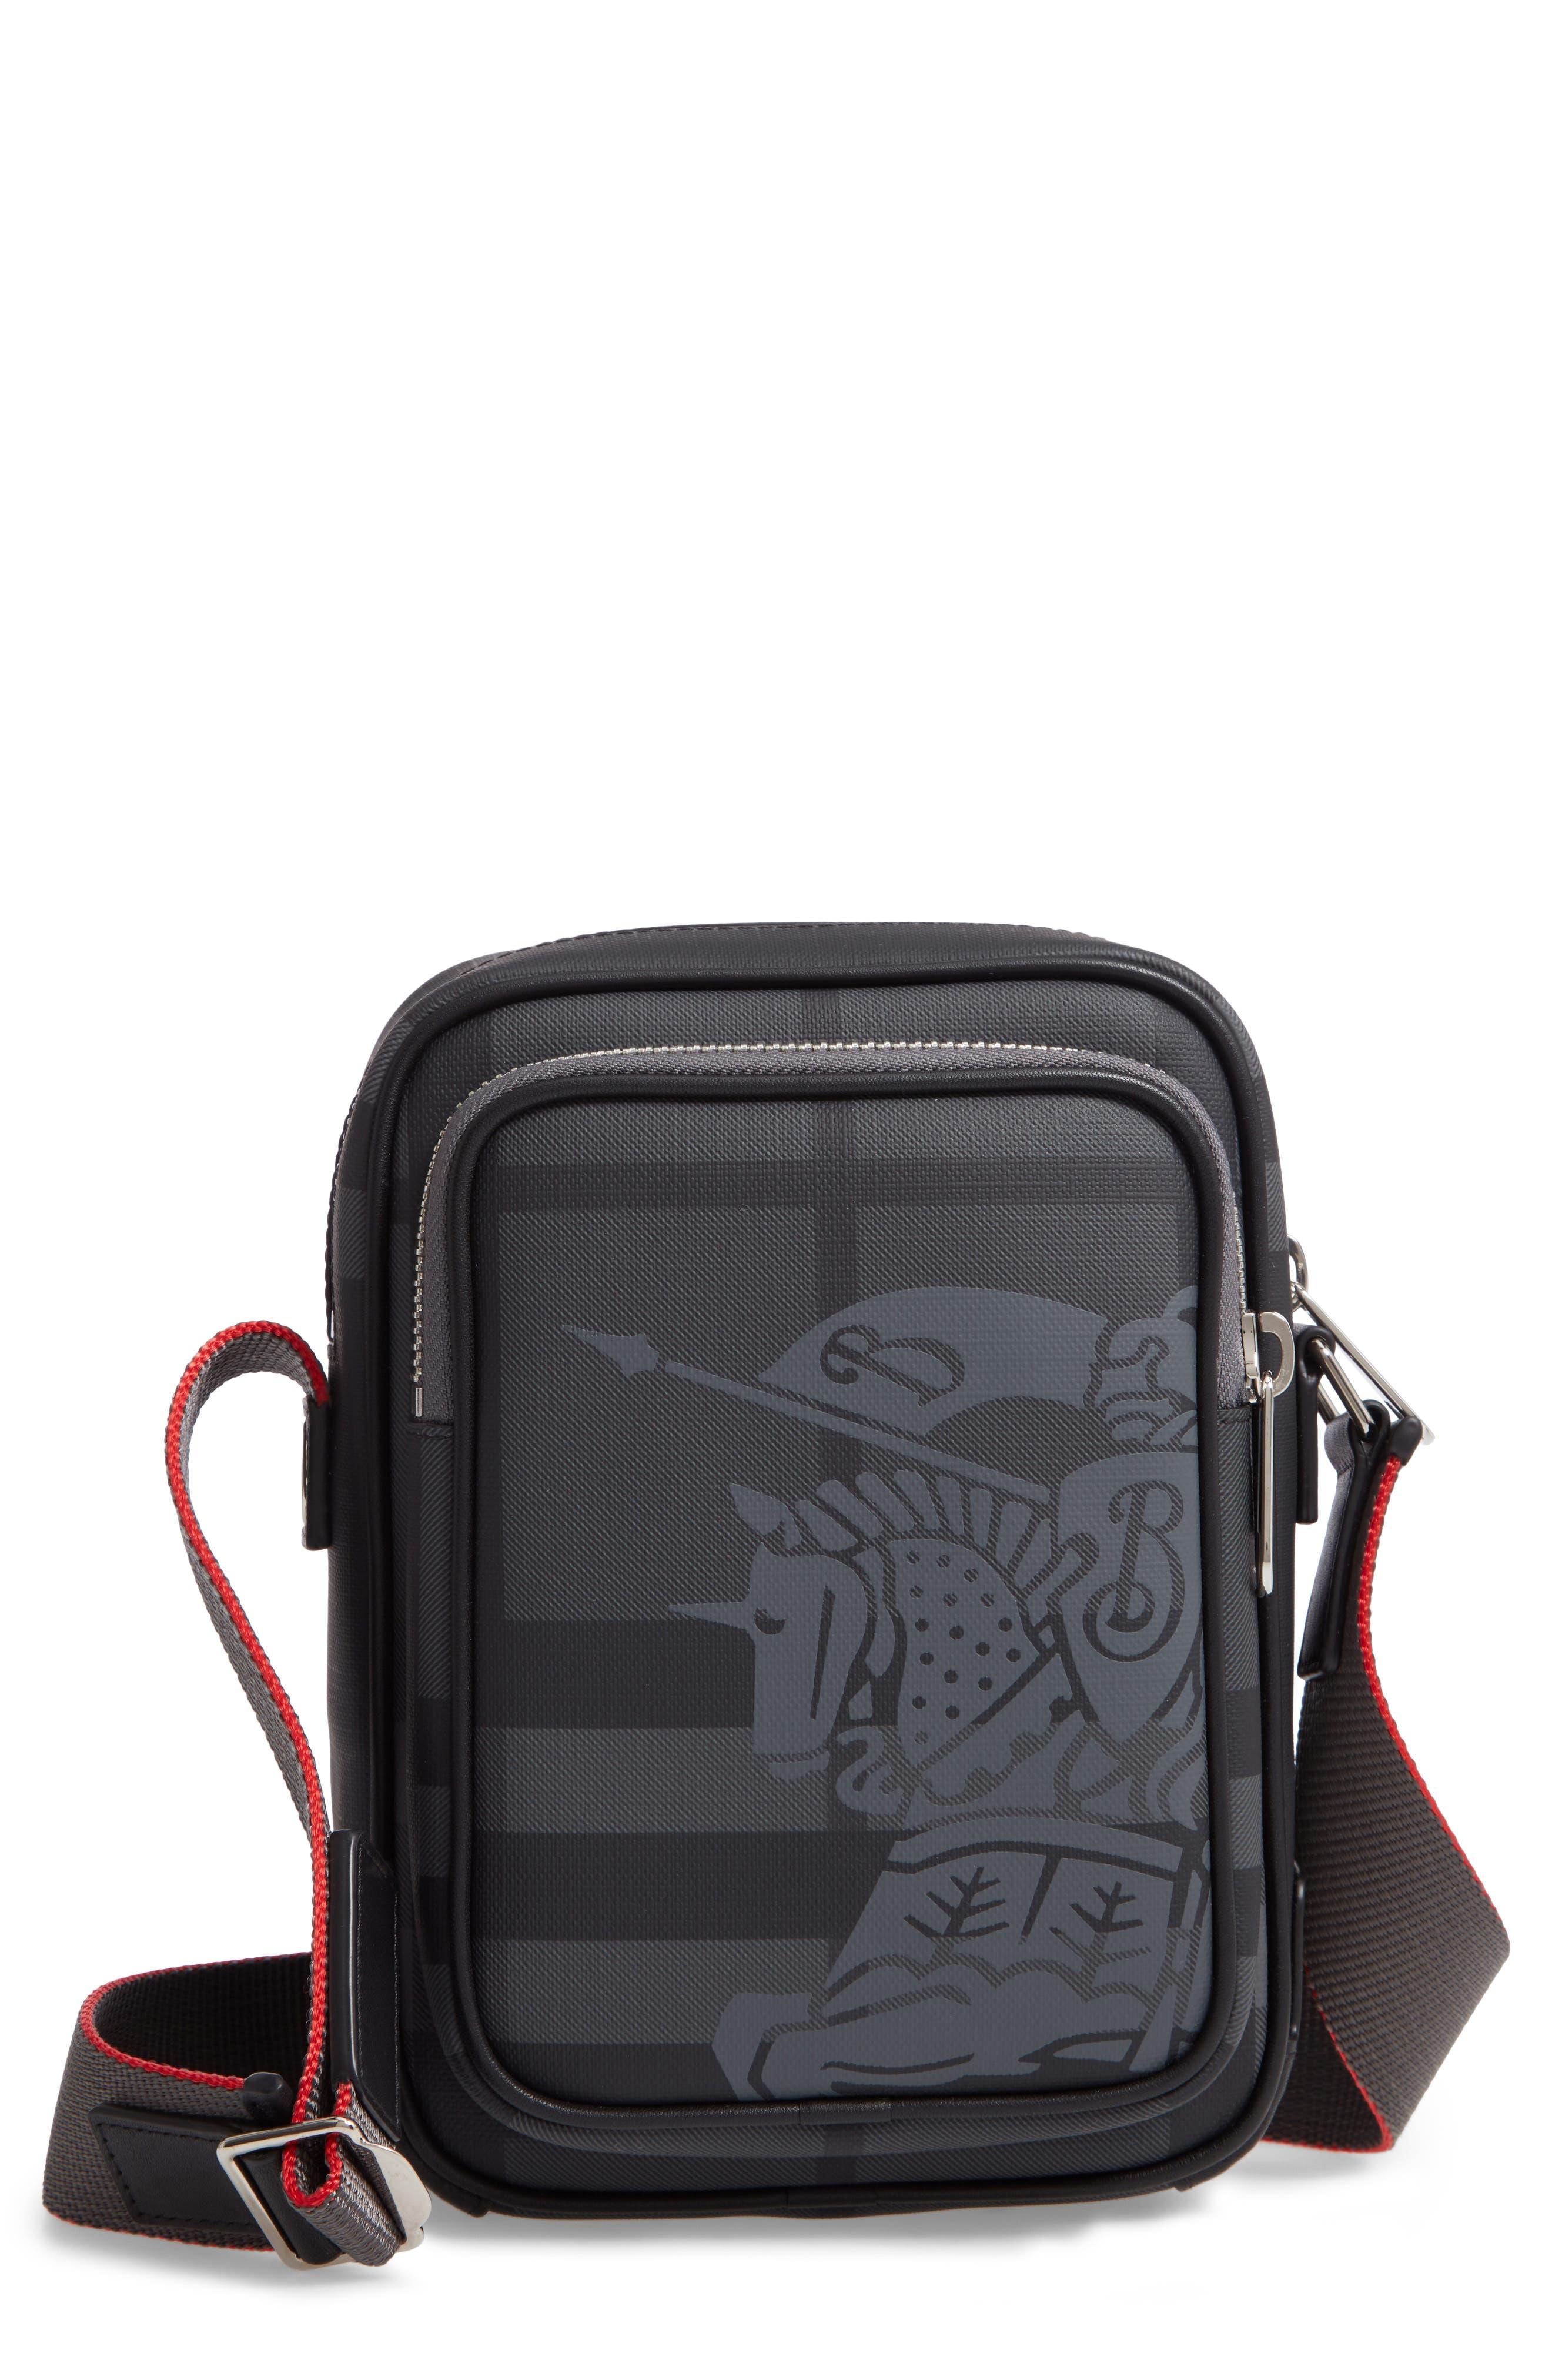 Freddie London Check Compact Messenger Bag,                             Main thumbnail 1, color,                             CHARCOAL BLACK